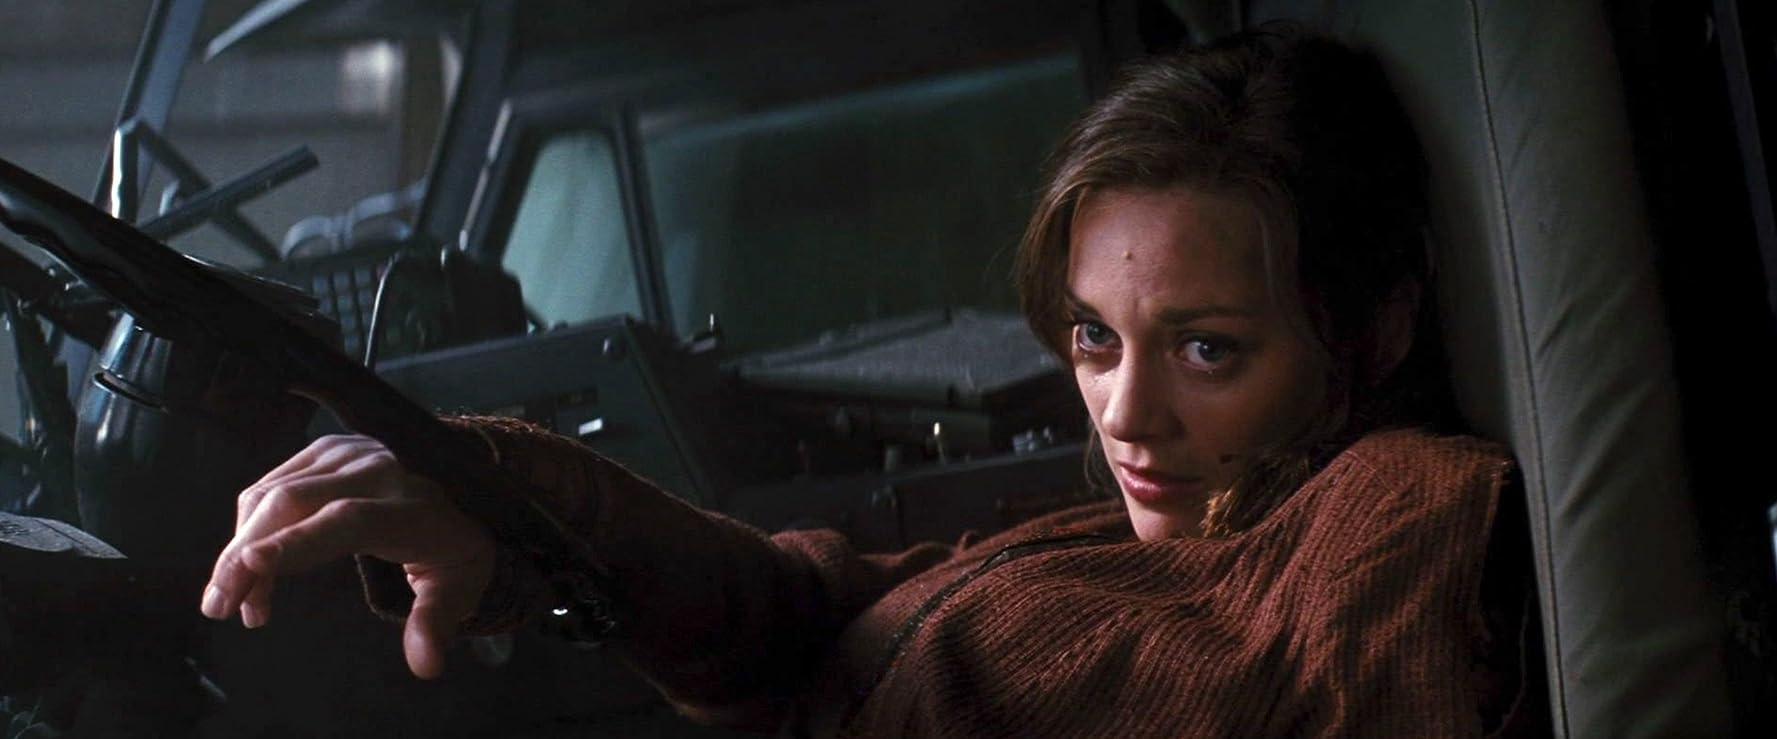 Marion Cotillard in The Dark Knight Rises 2012